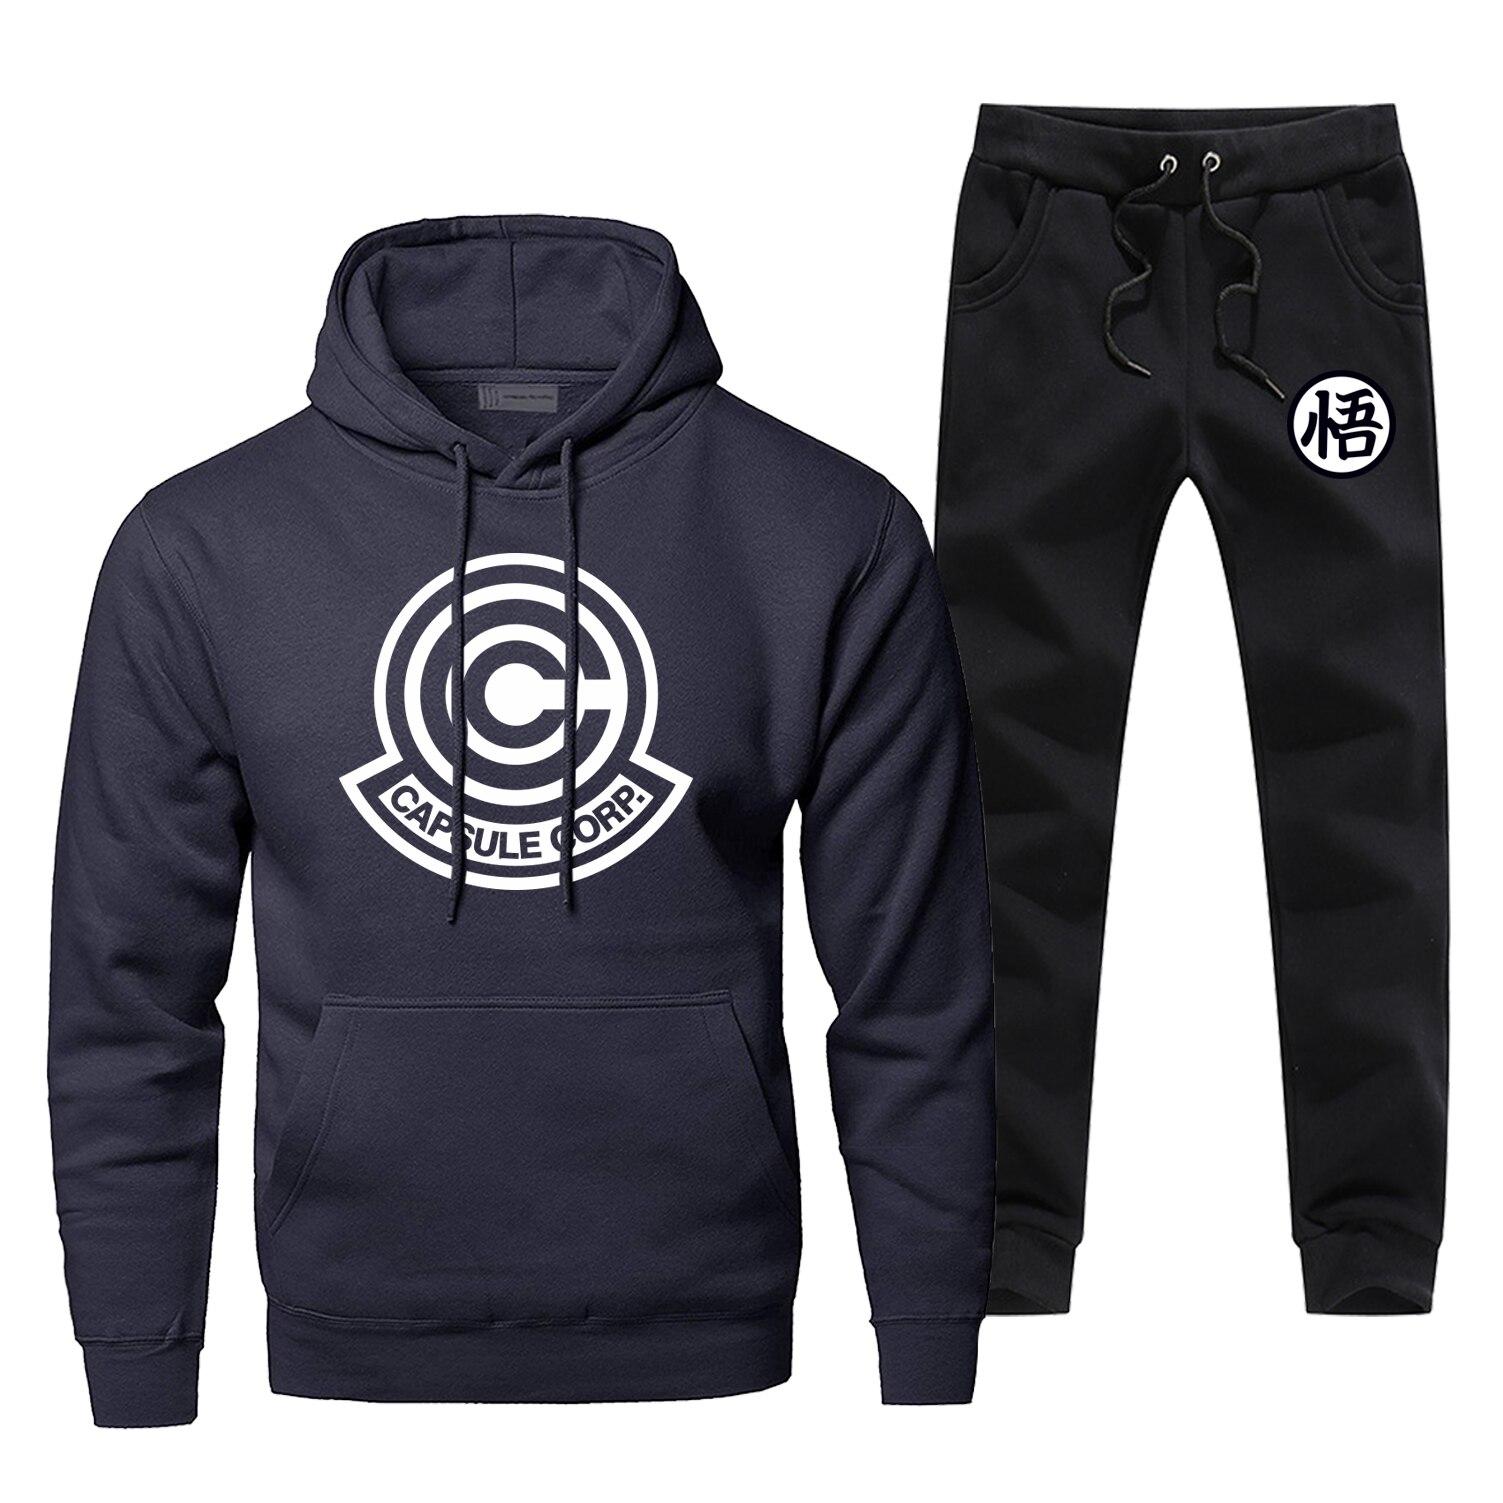 Anime japonês dragon ball z capsule corp hoodies calças define masculino moda moletom de lã hip hop streetwear casual esportiva